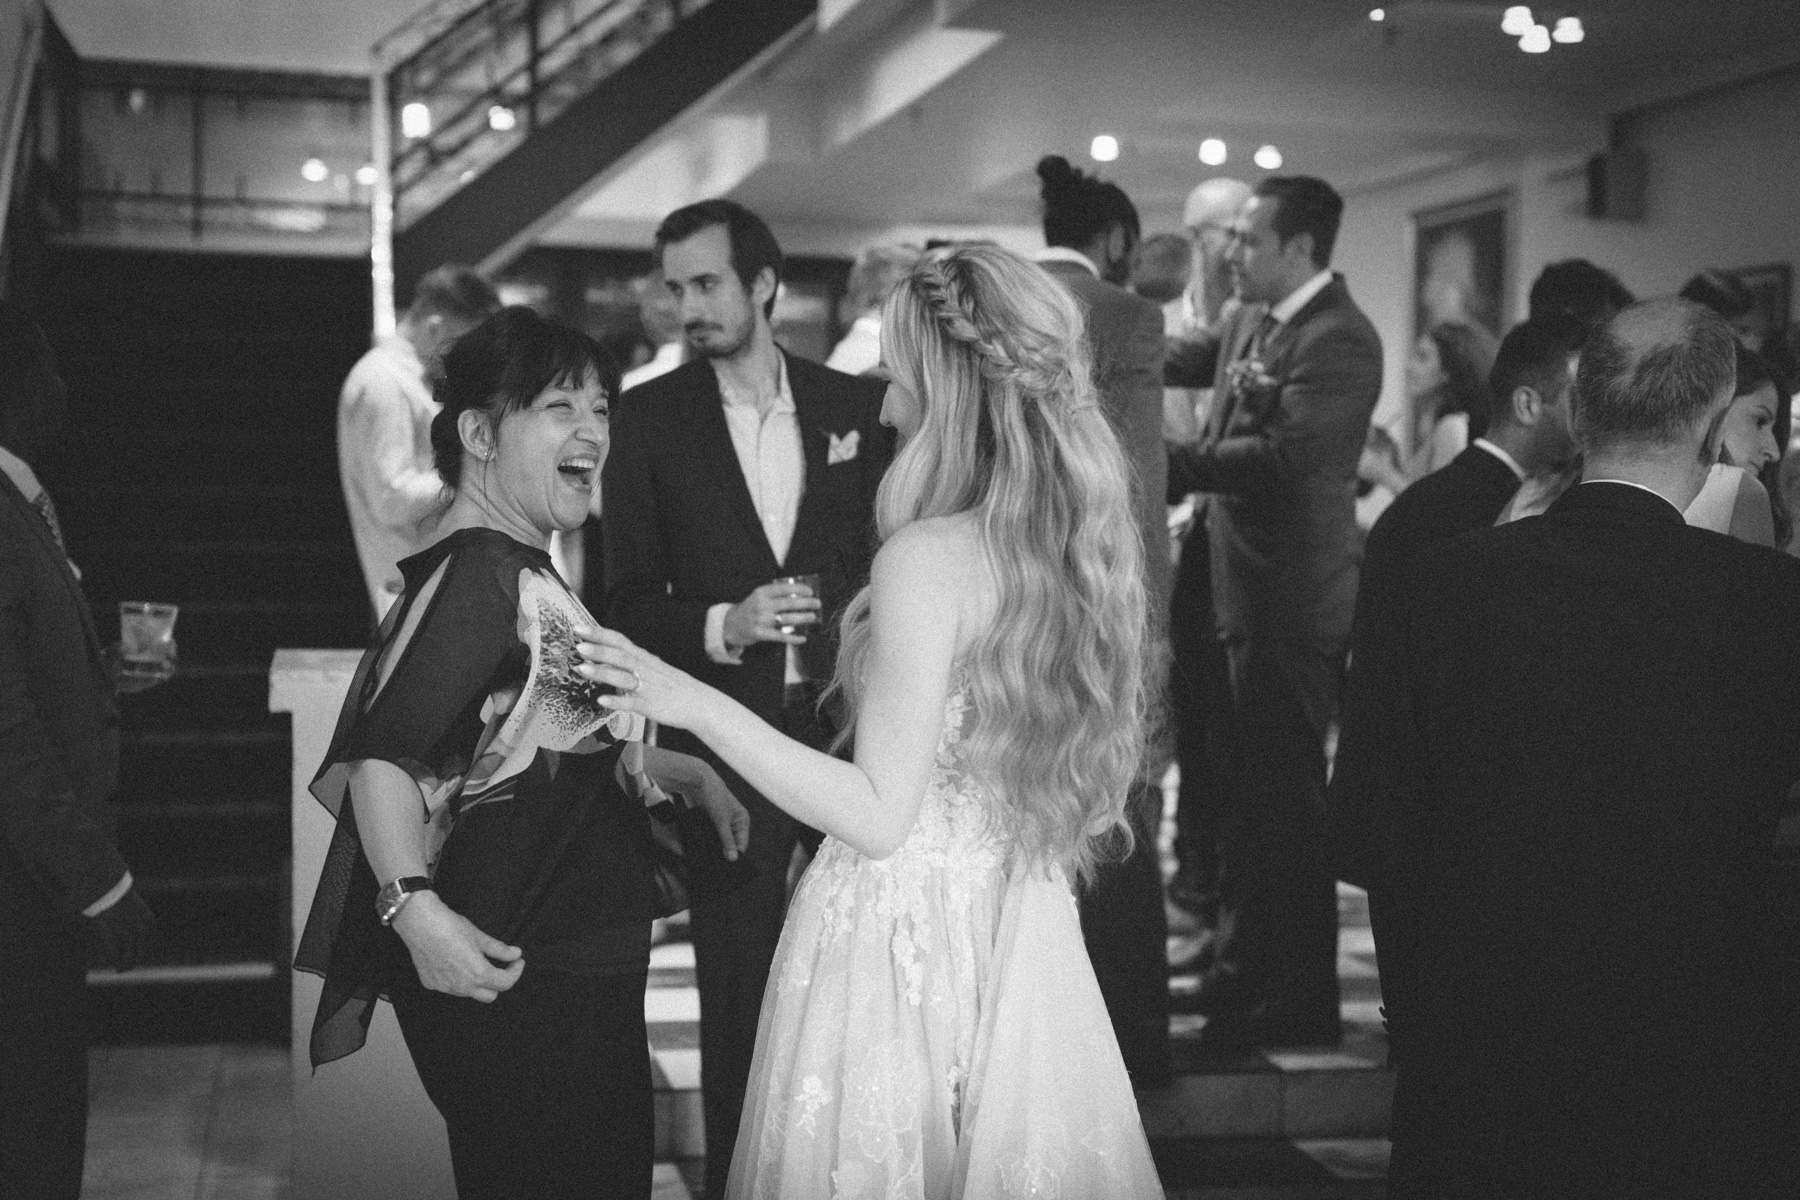 La-Maquette-wedding-by-Toronto-modern-wedding-photographer-Sam-Wong_43.jpg